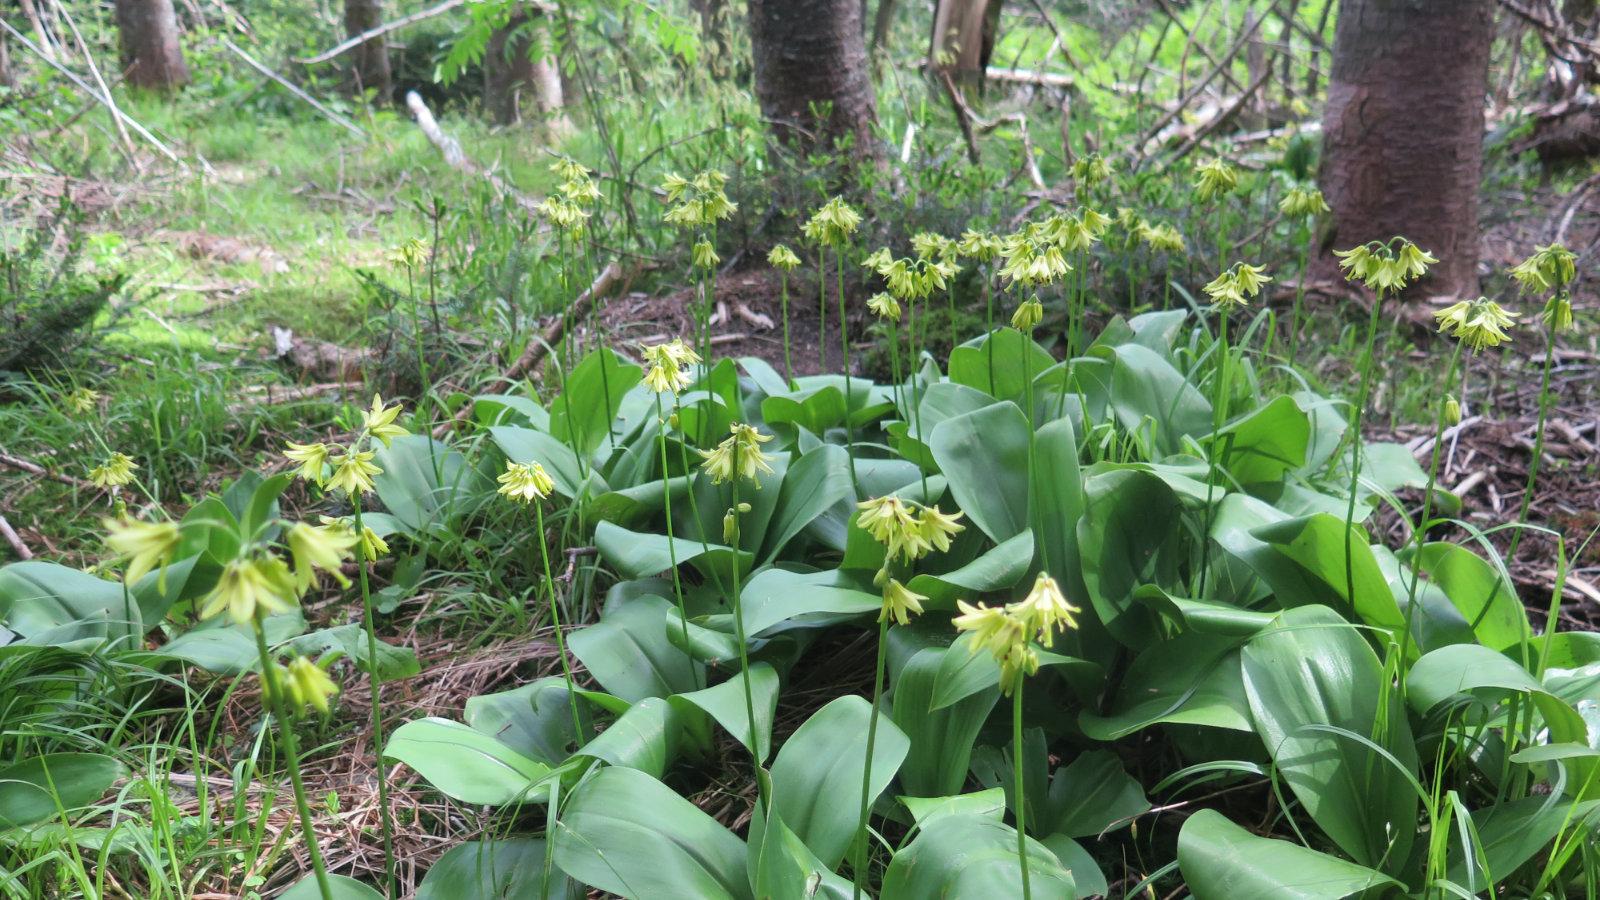 Moosilauke-Trout-Lilies-20190627